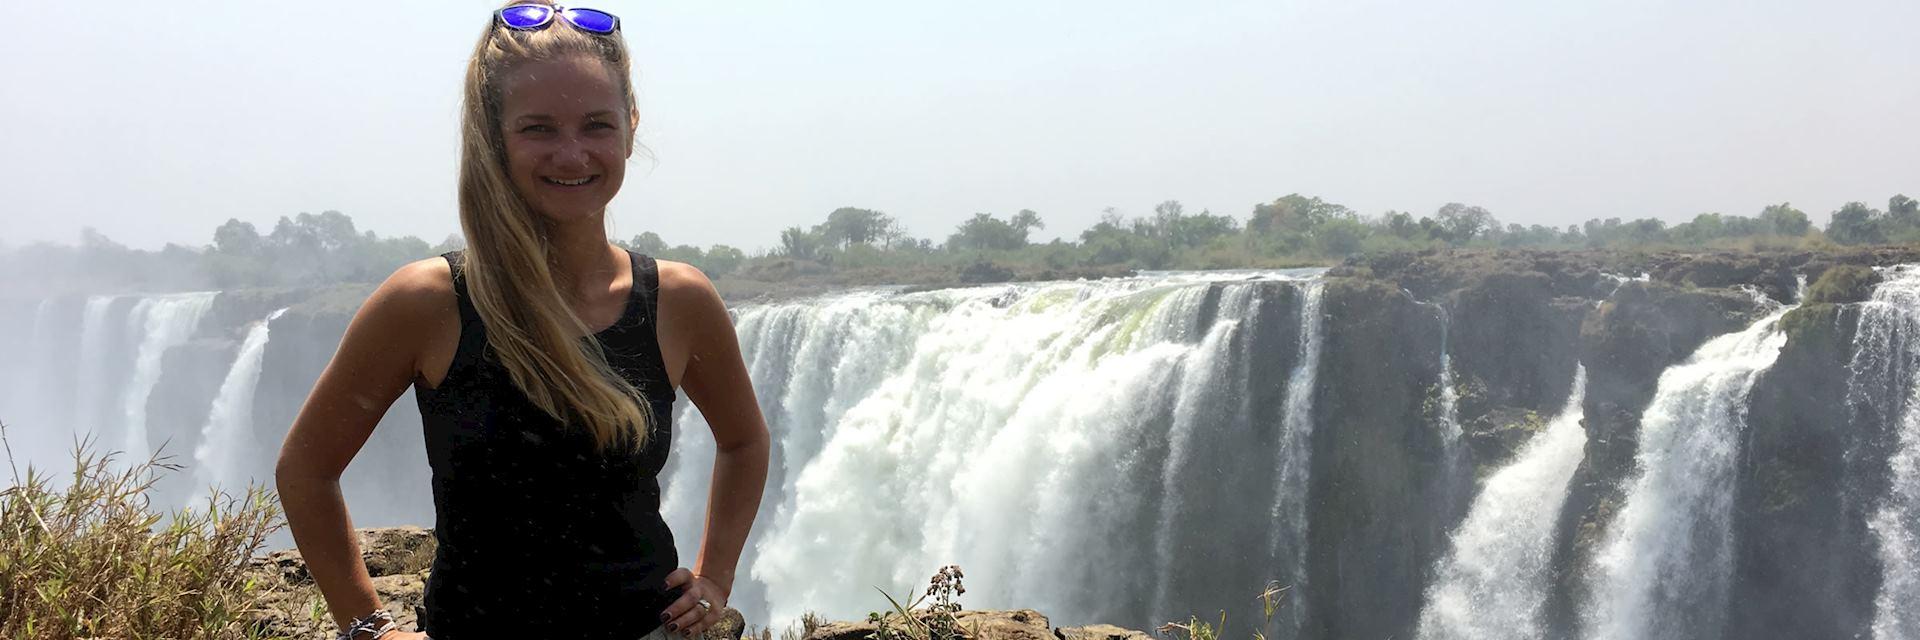 Willa at Victoria Falls